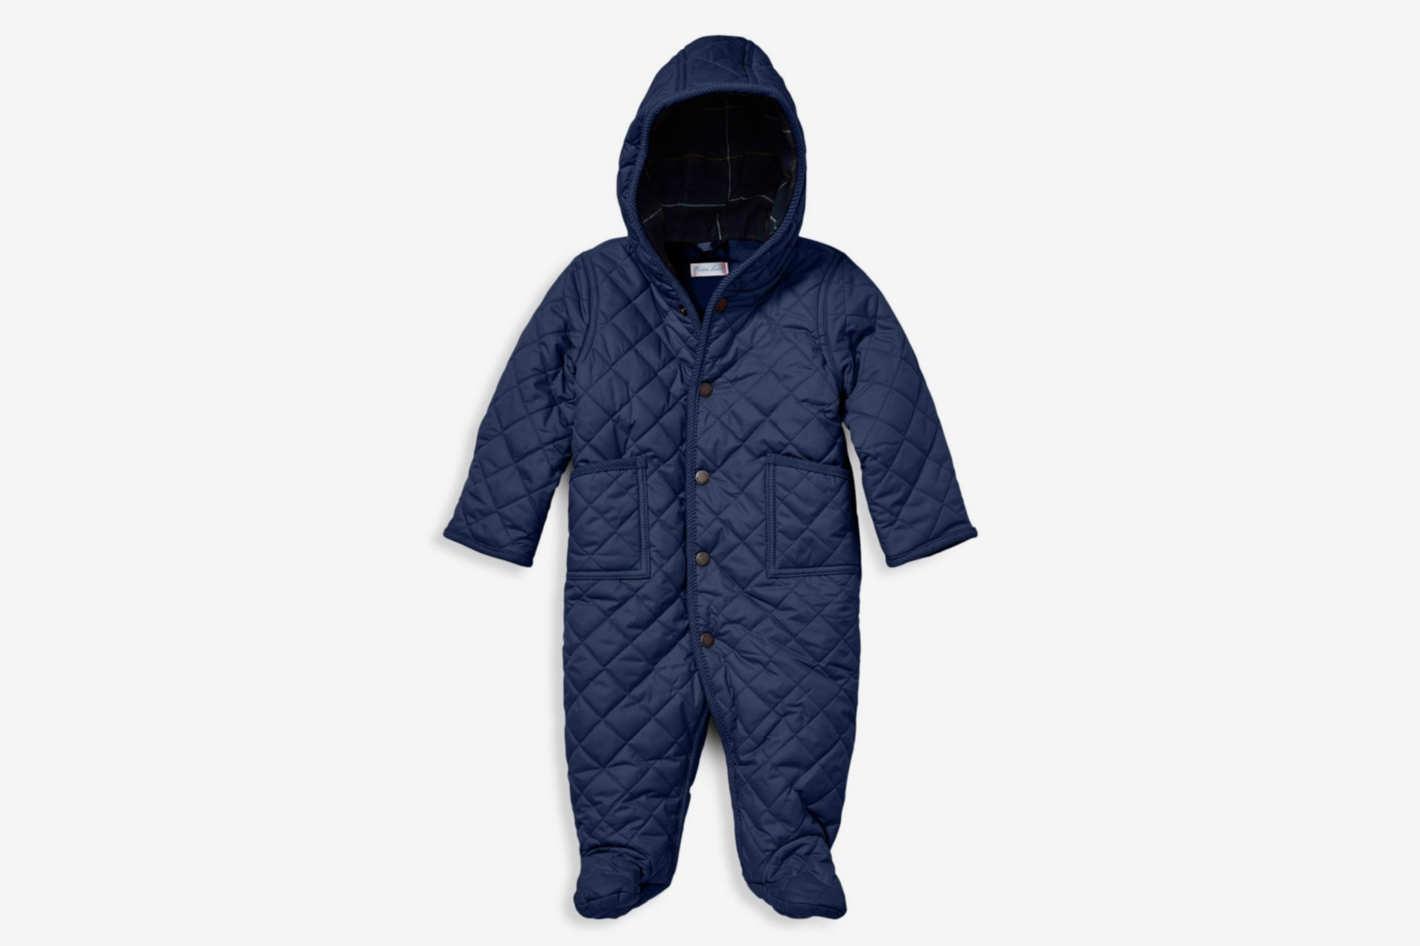 Ralph Lauren Baby Boy's Barn Bunting Snowsuit